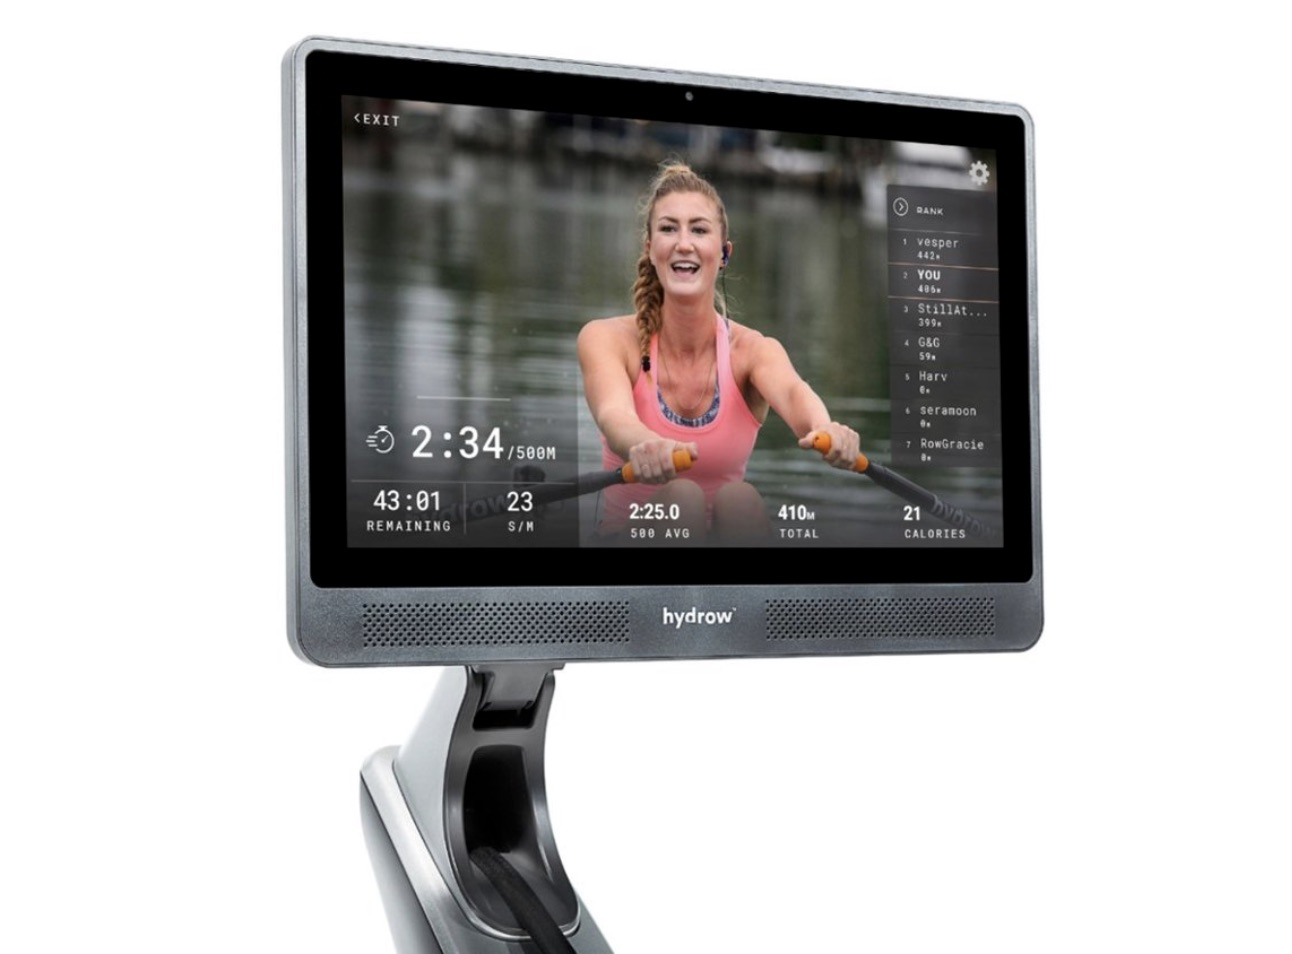 Hydrow Rowing Machine Monitor